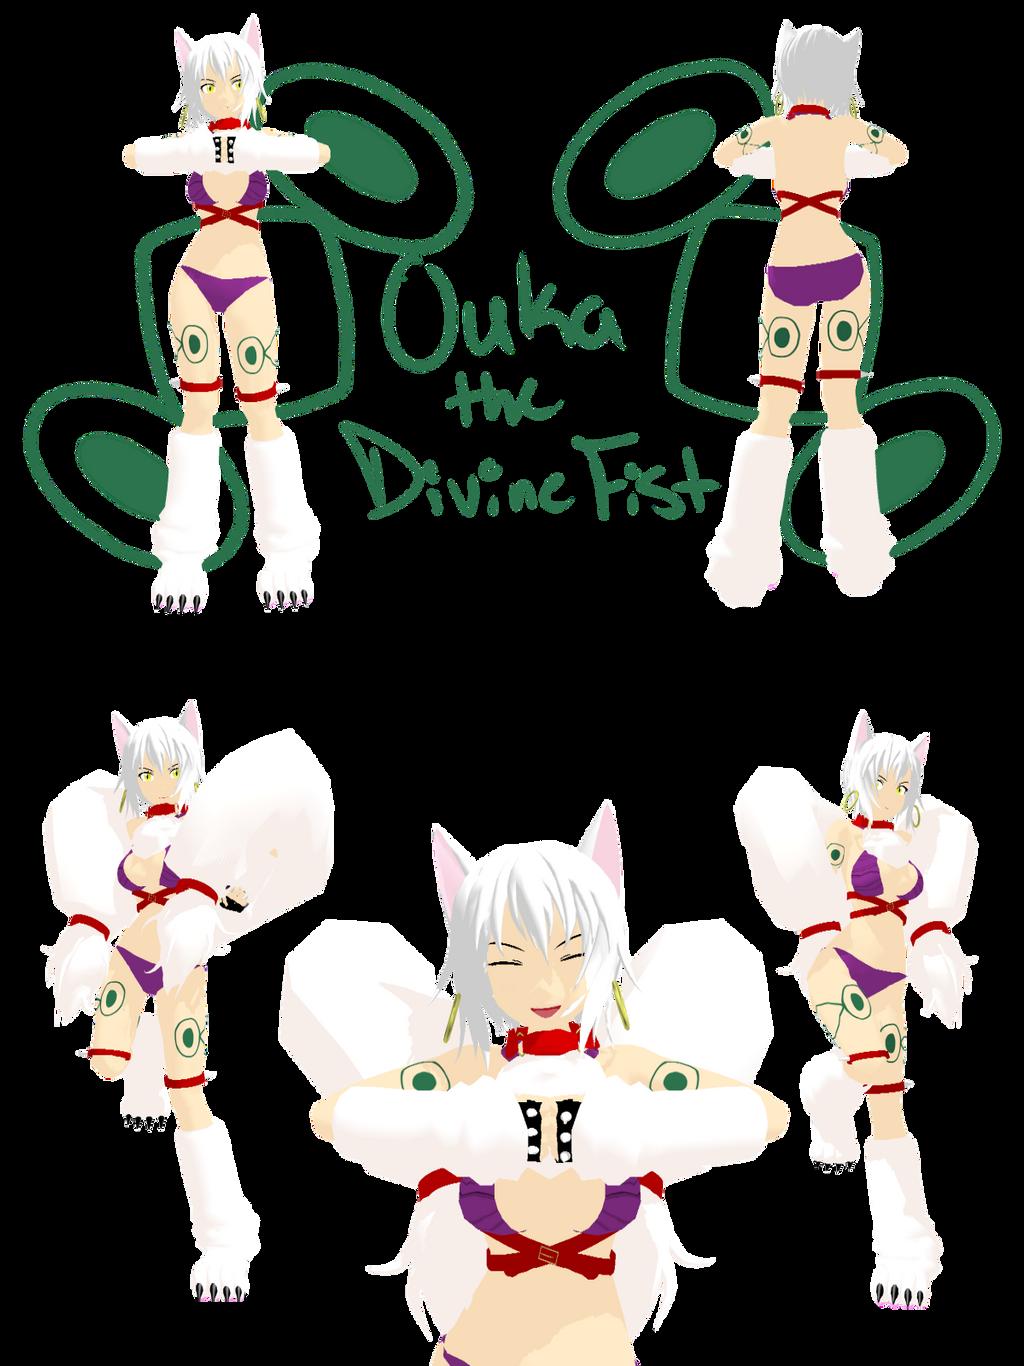 divine fist ouka